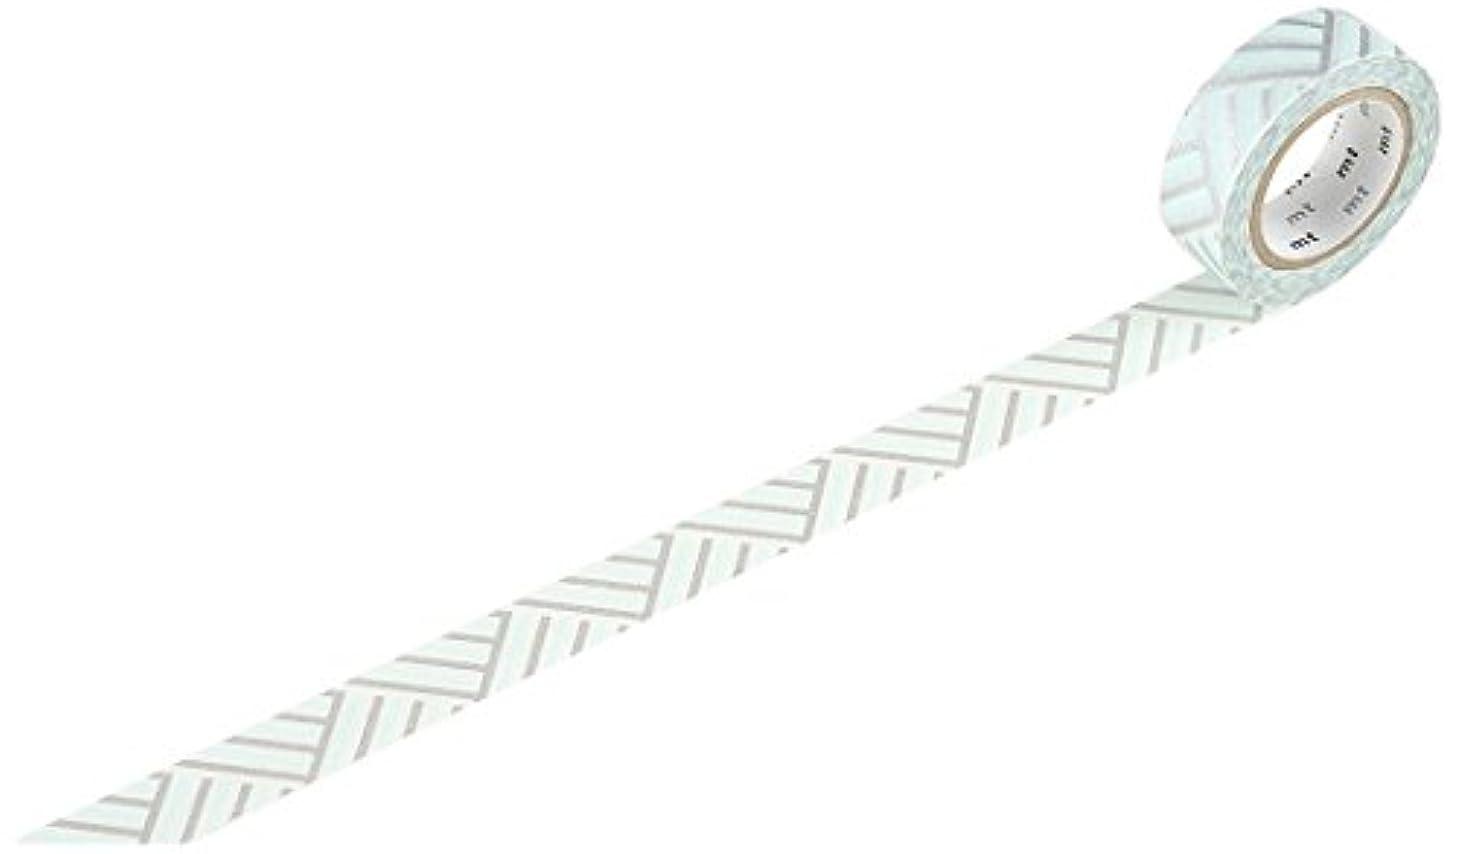 mt Corner Izumi Masking Tape Roll - Parent